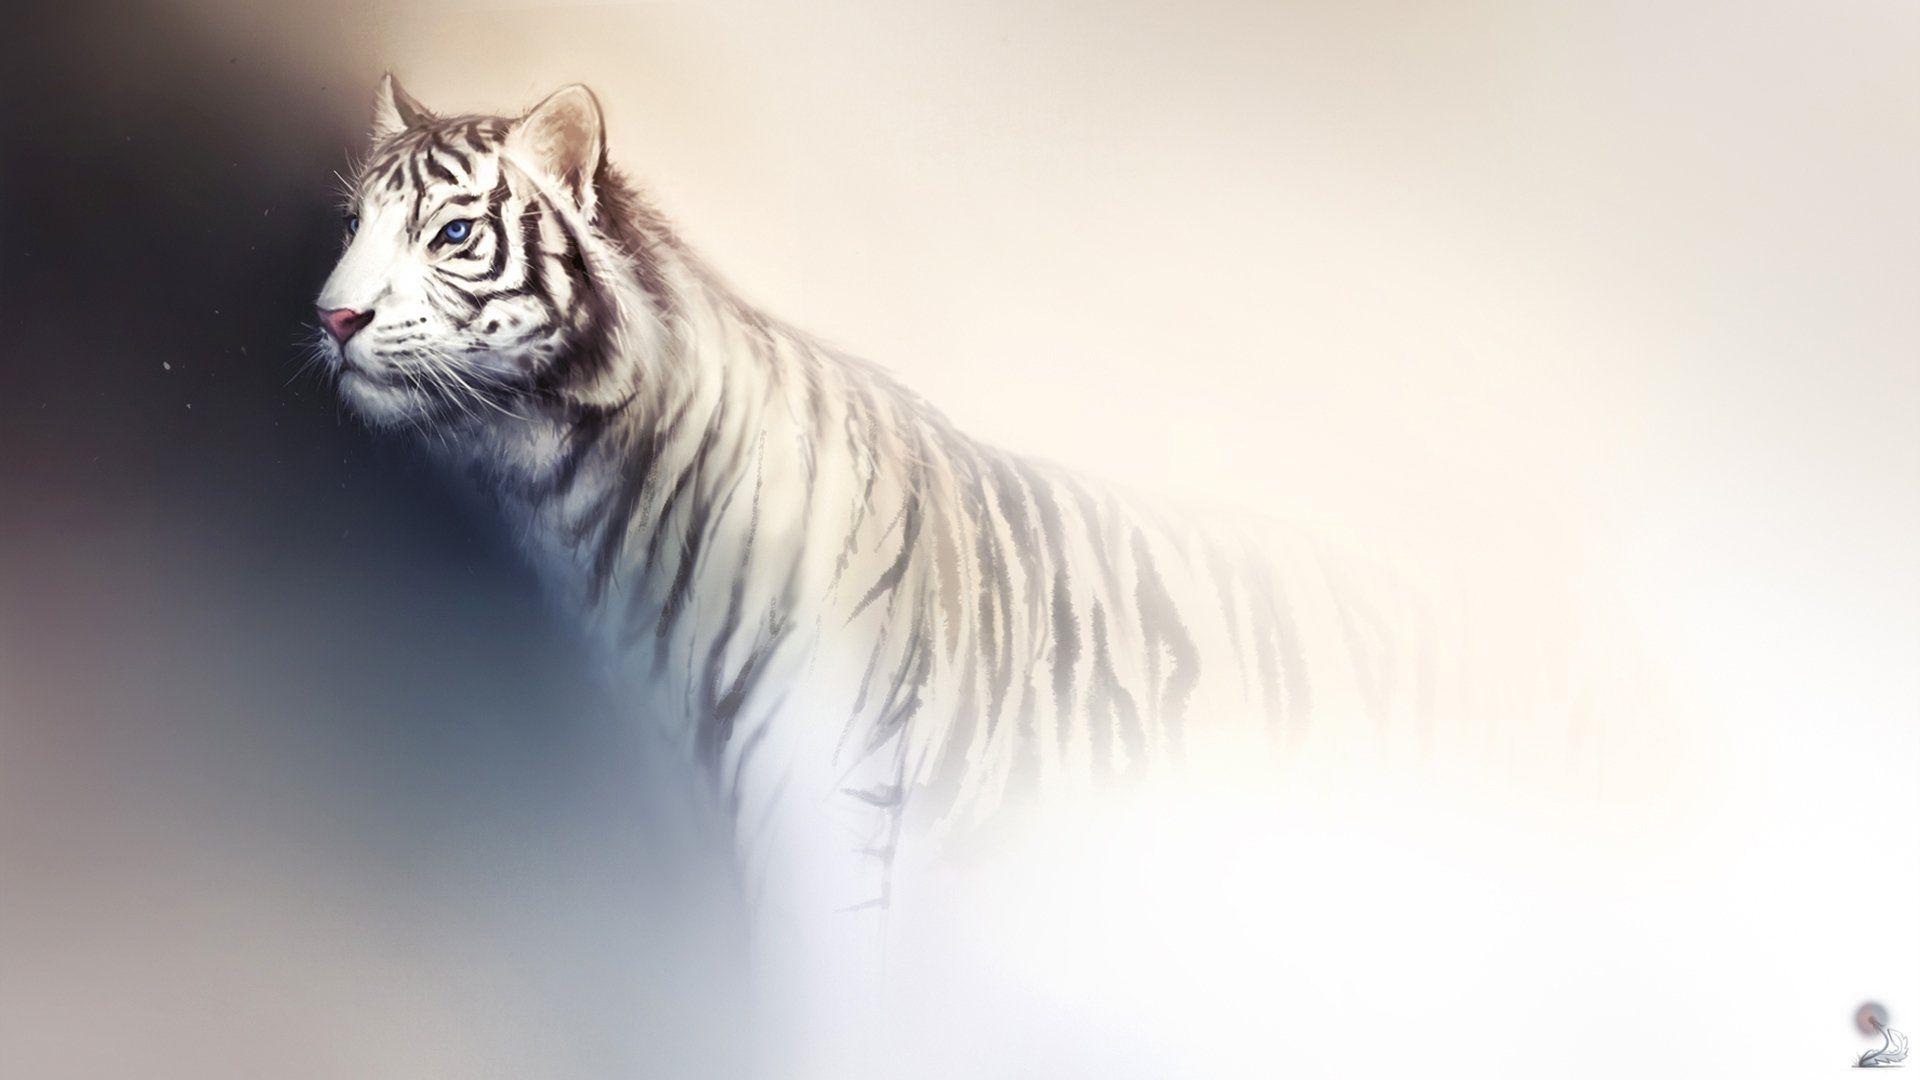 White Tiger Art, Background Wallpaper